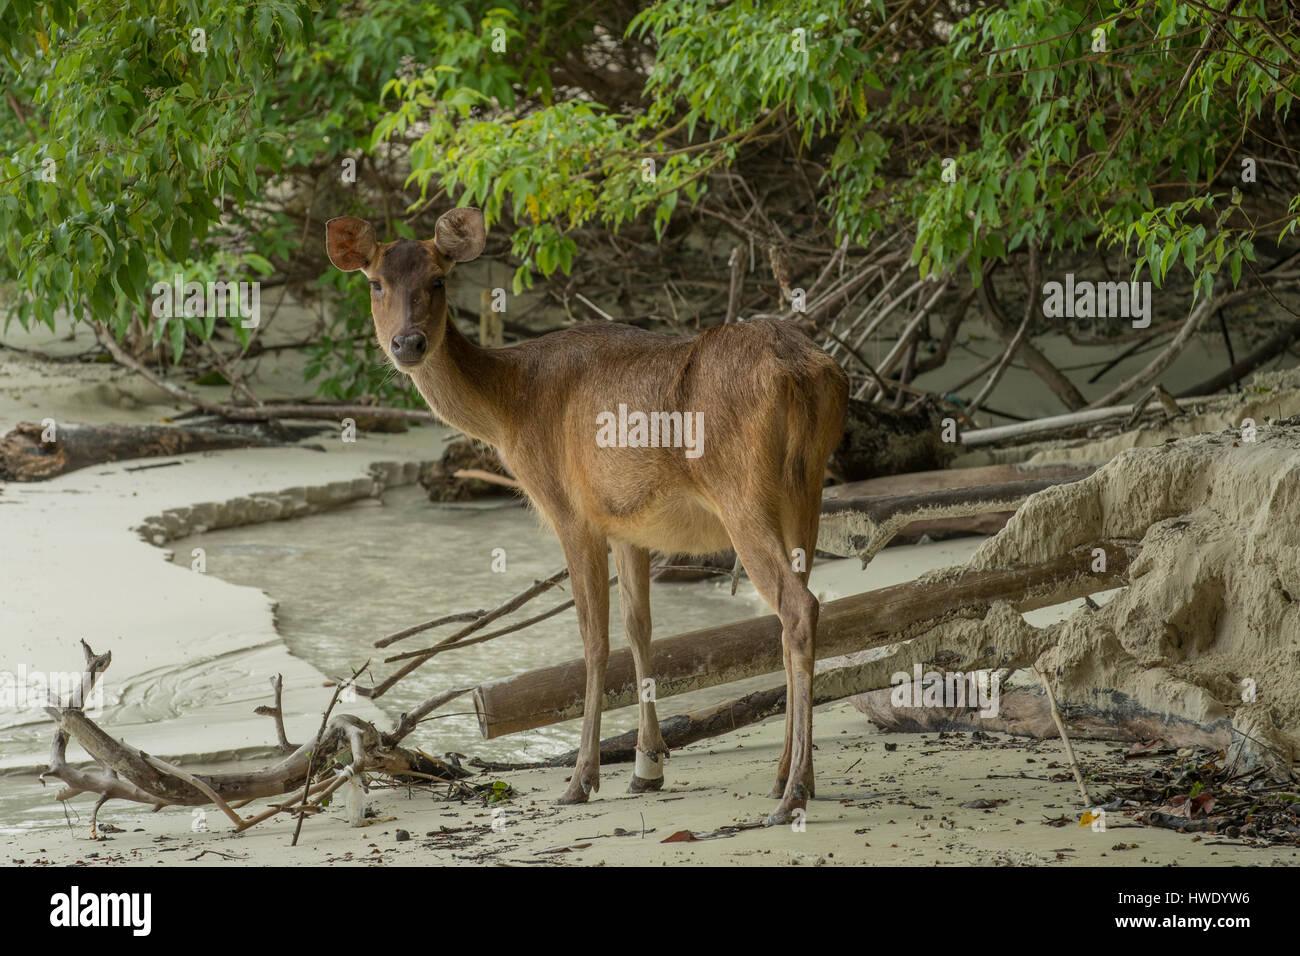 Sunda Sambar Deer, Rusa timorensis in Ujung Kulon National Park - Stock Image